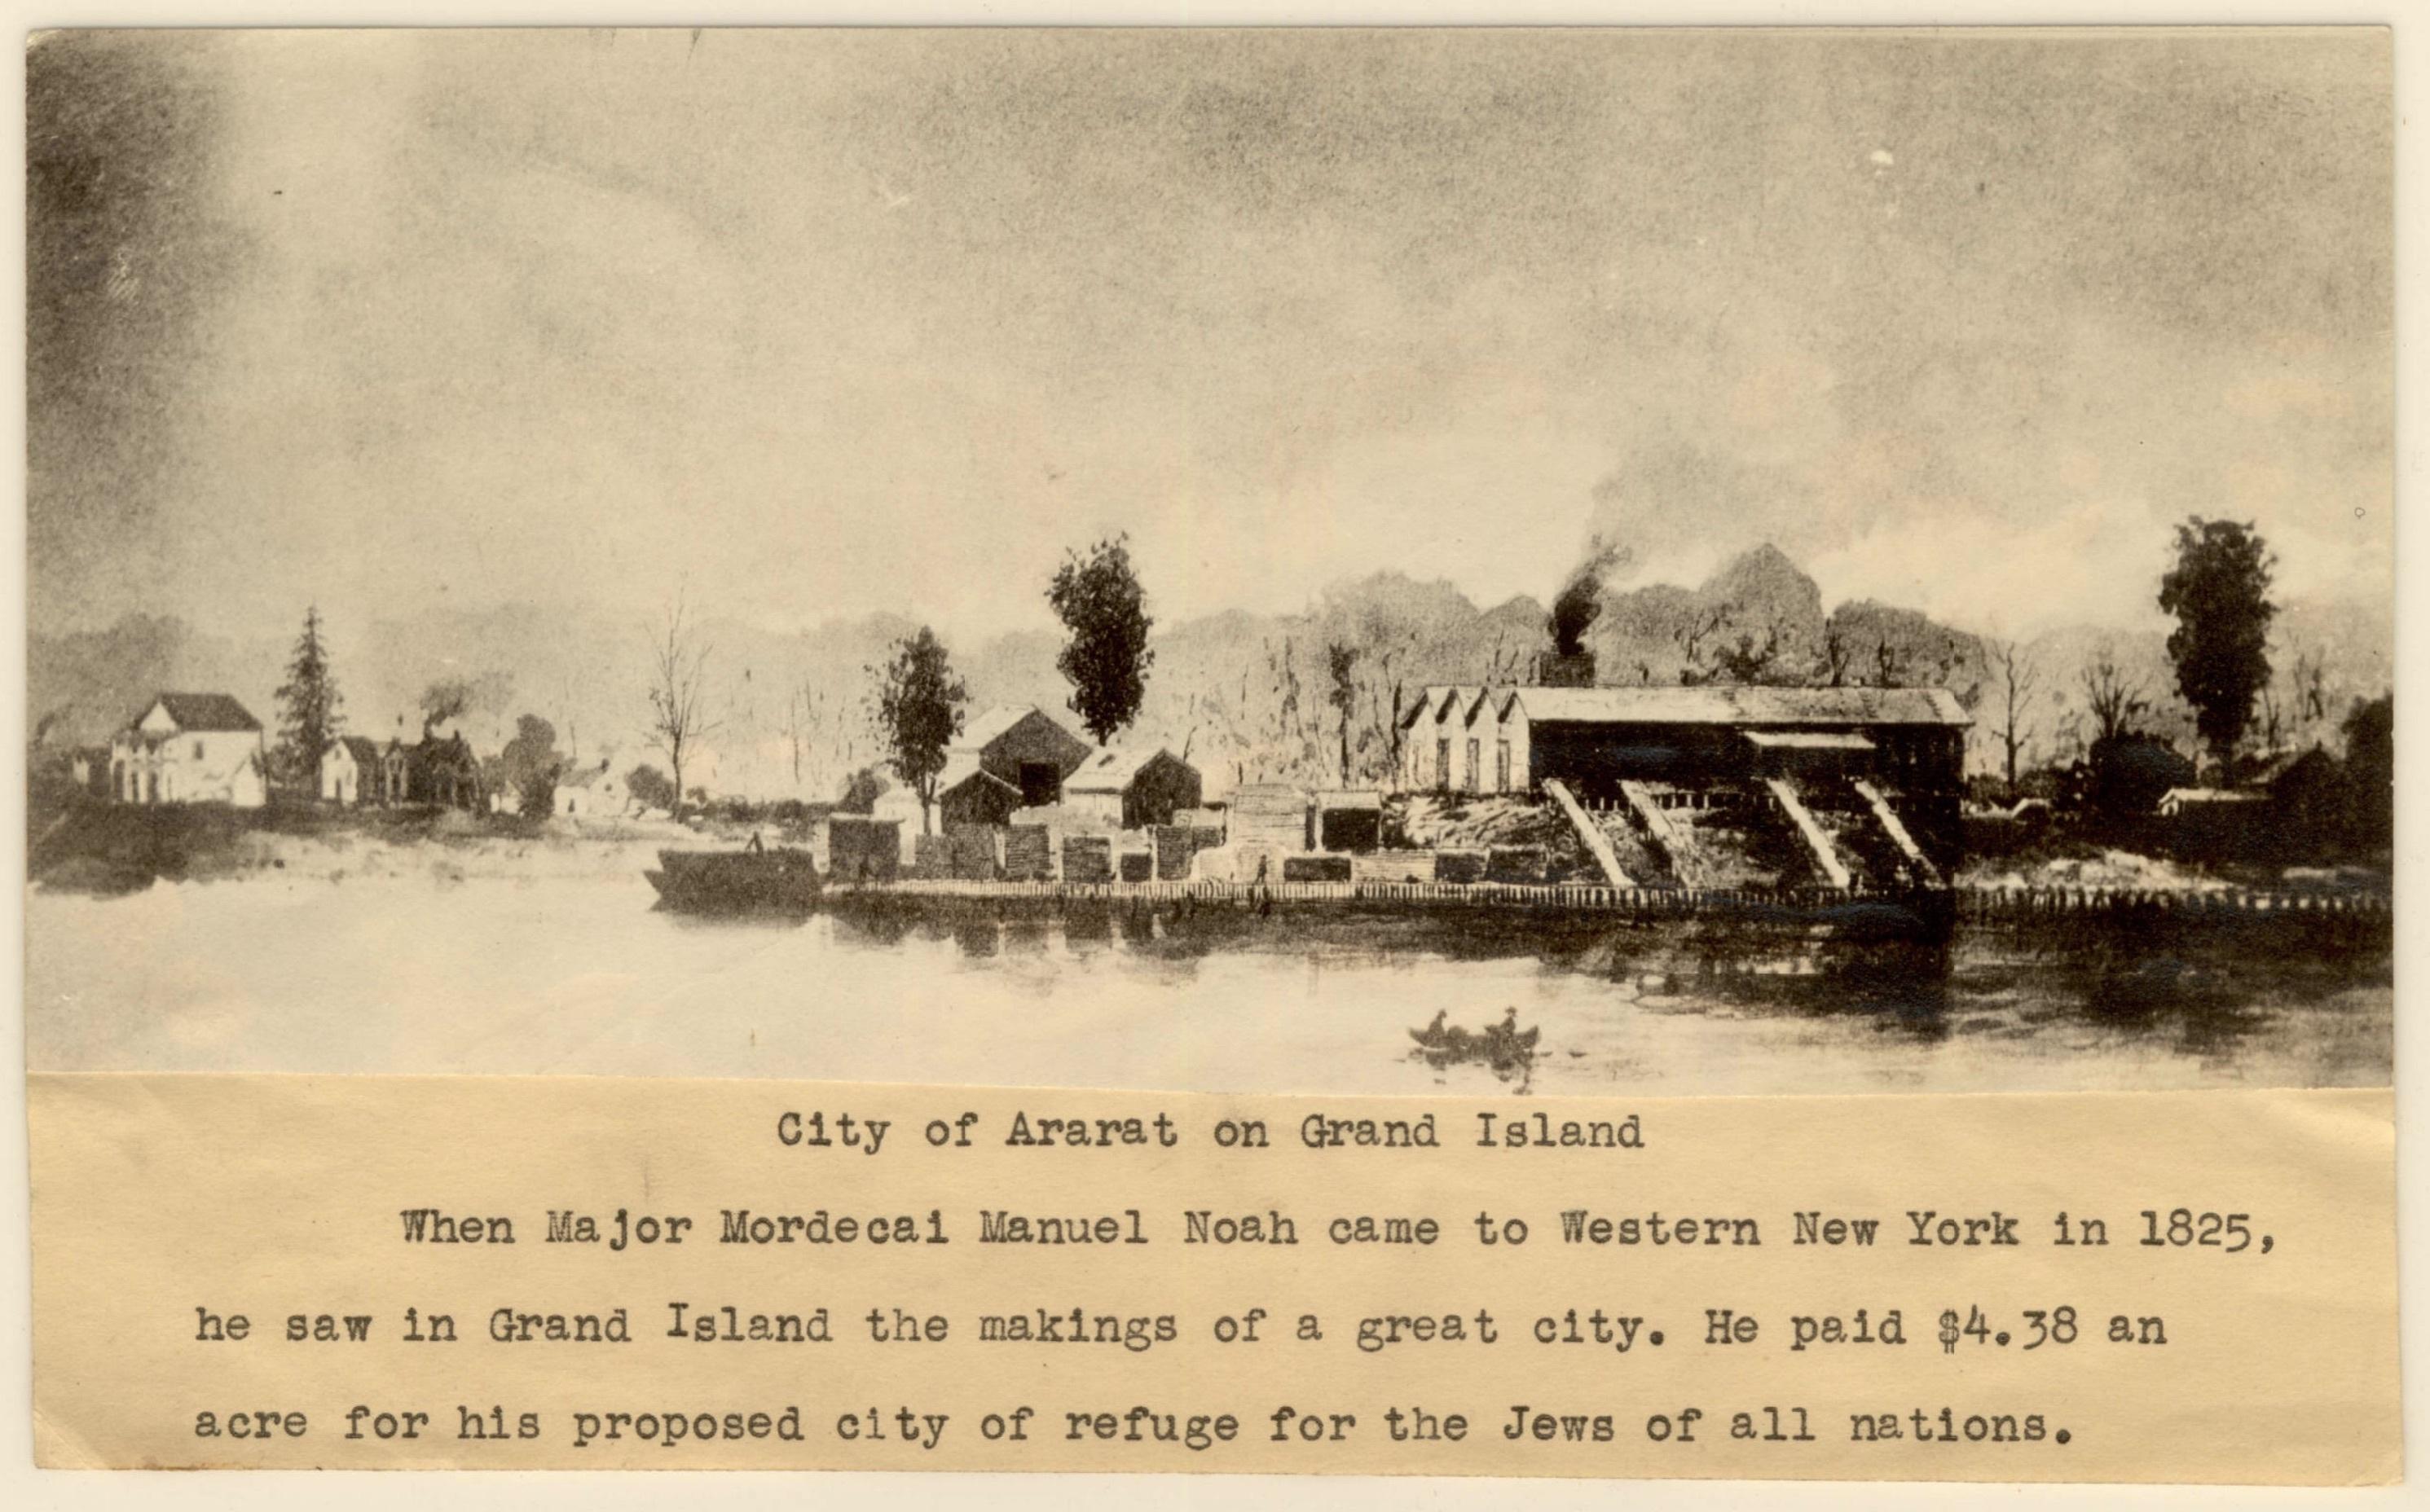 City of Ararat on Grand Island, illustration (Buffalo and Erie County Public Library, 1825).jpg